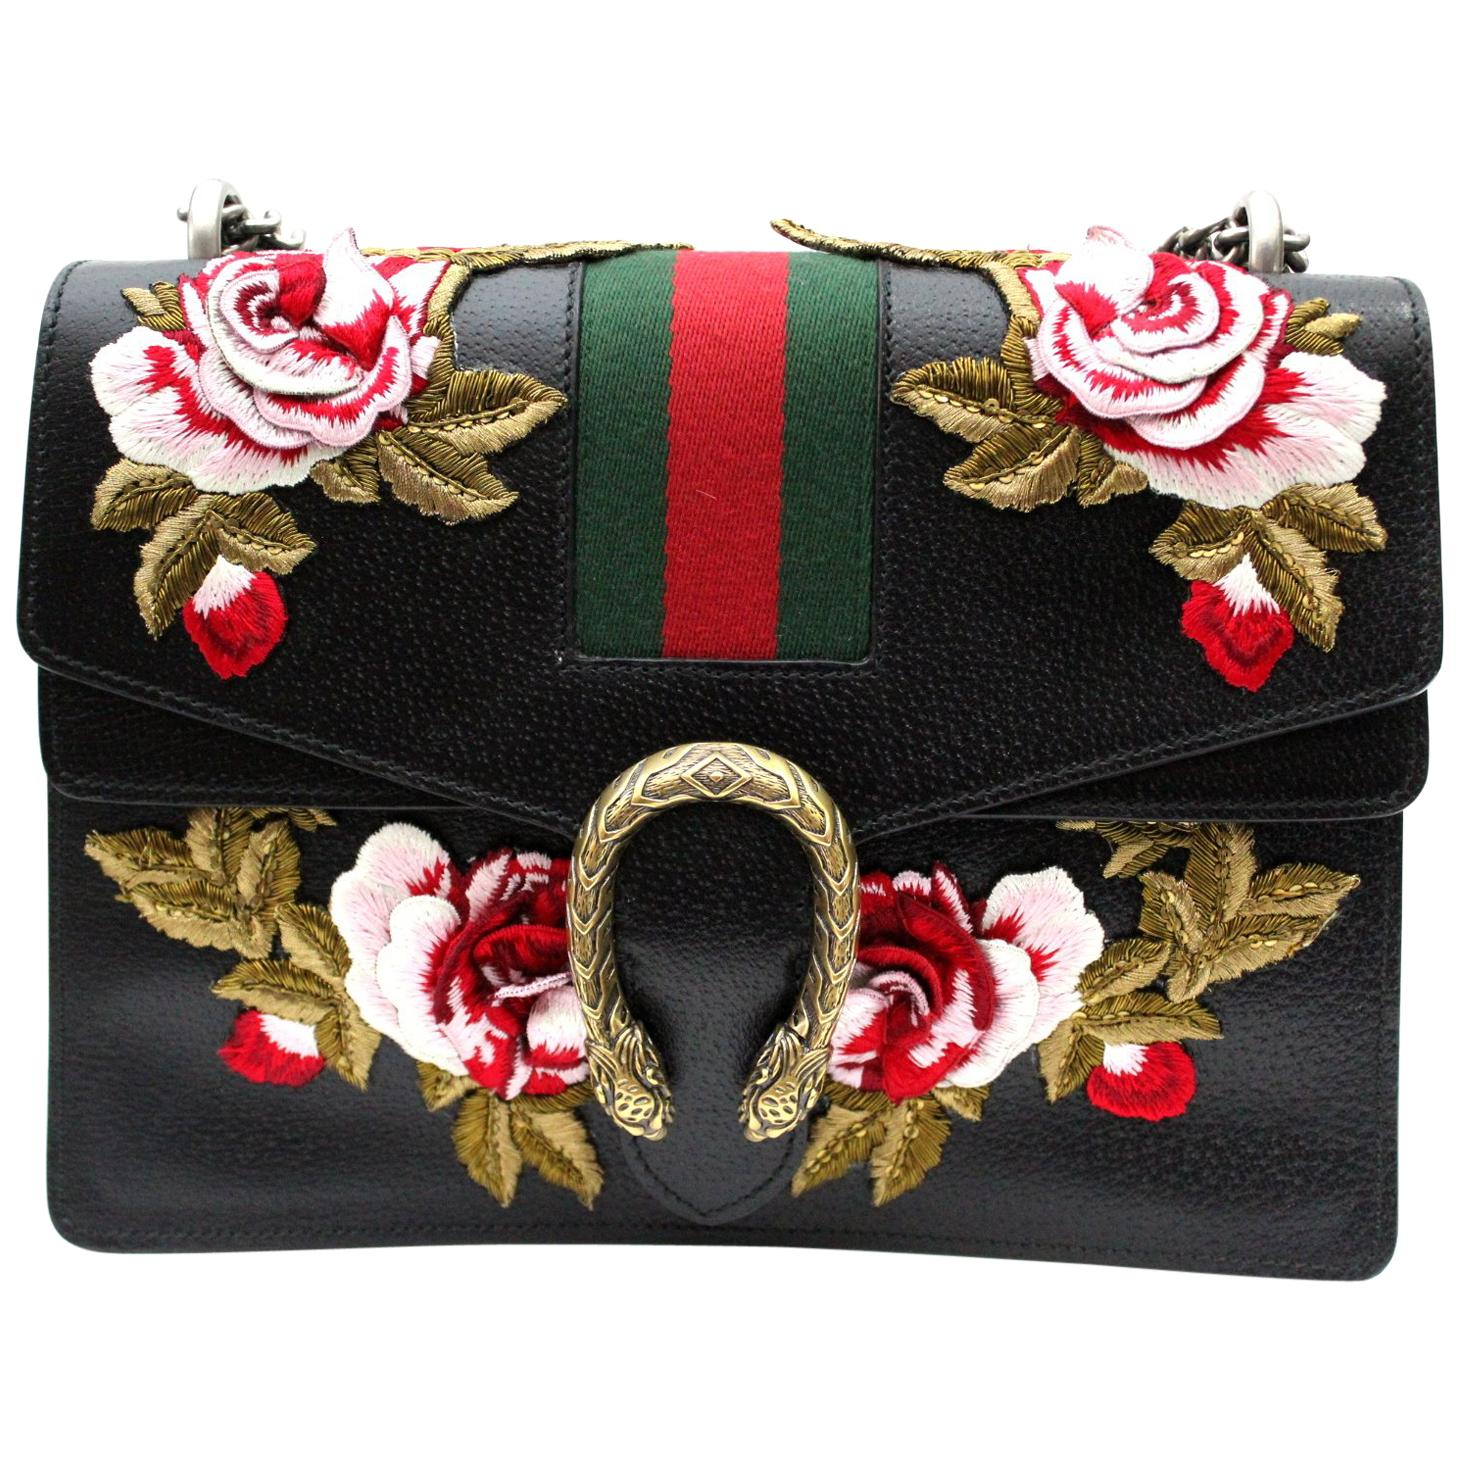 Gucci Dionysus New Medium Embroidered Roses Shoulder Bag